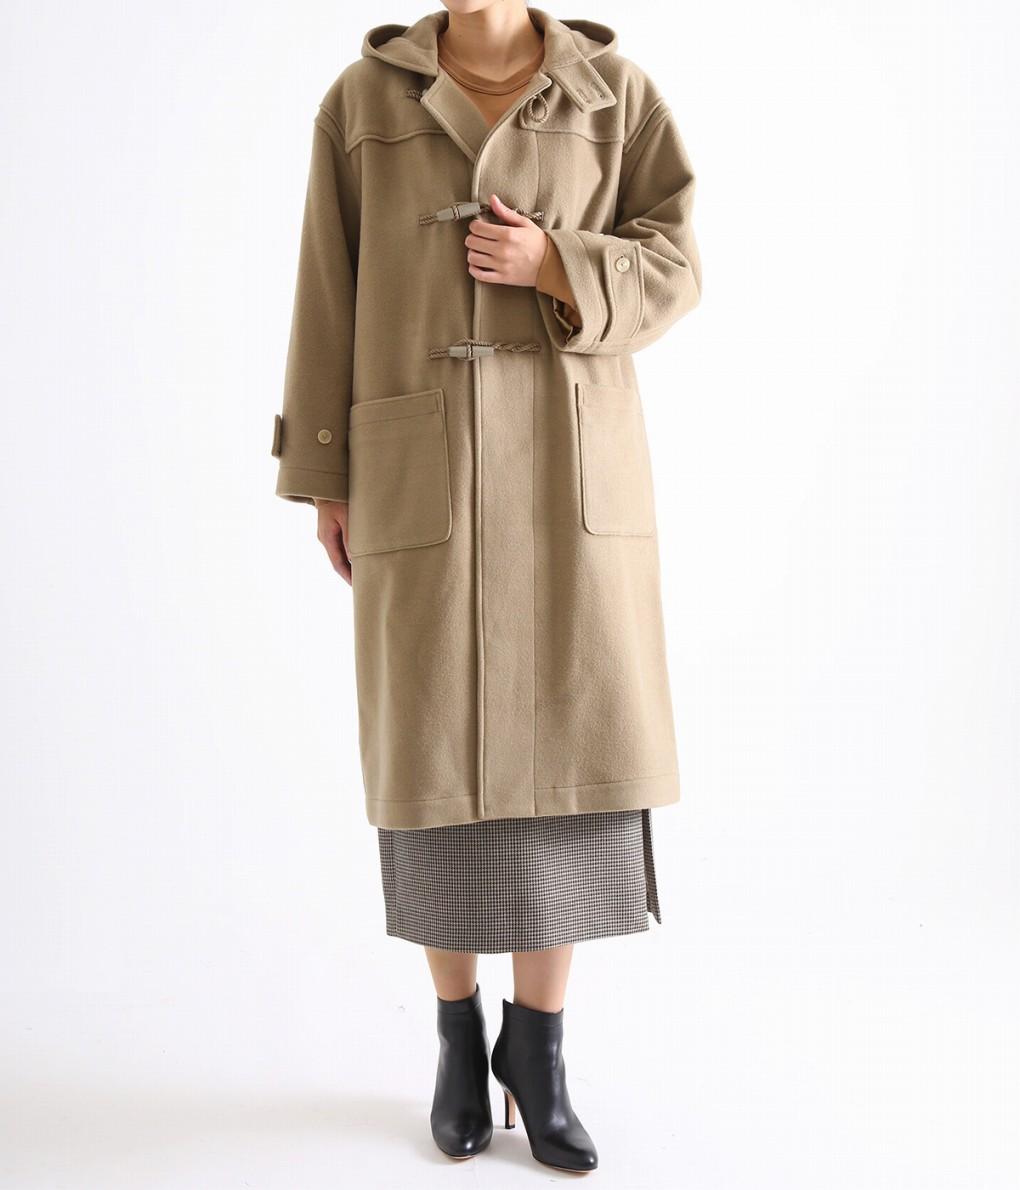 AURALEE / オーラリー : CASHMERE WOOL MOSSER BIG DUFFLE COAT : ロング丈 ダッフルコート カシミヤ ウールモッサーコート ビックシルエット : A8AC03MC 【ANN】